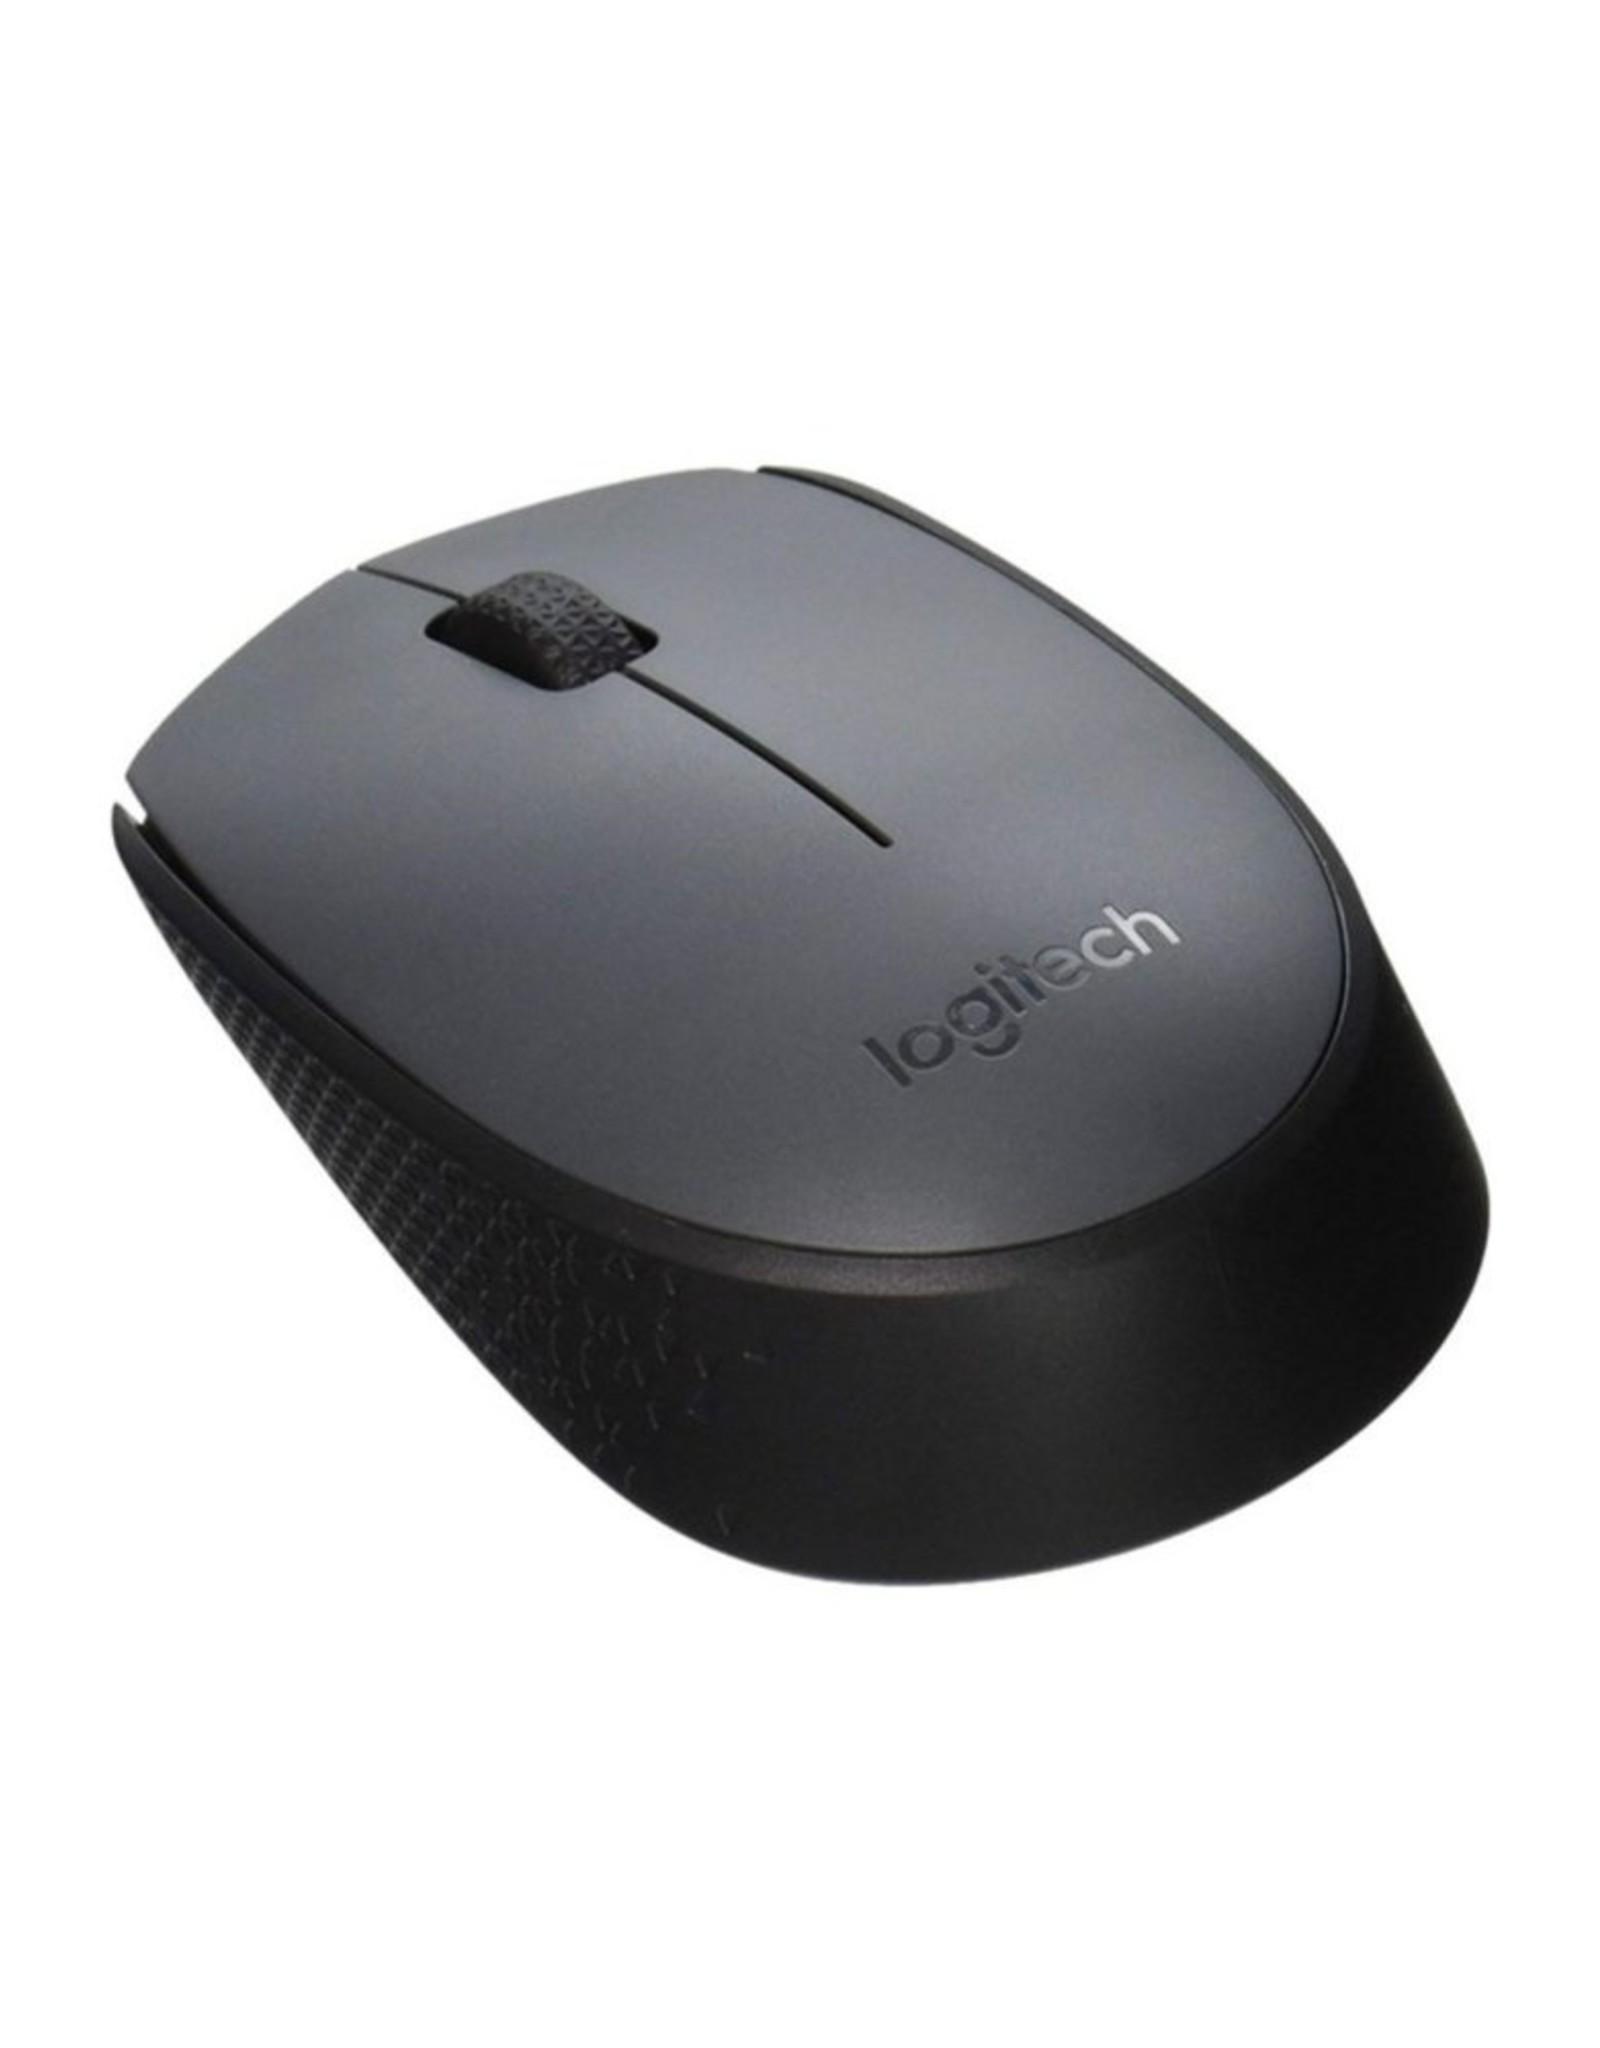 Logitech M170 Wireless Mouse Grey